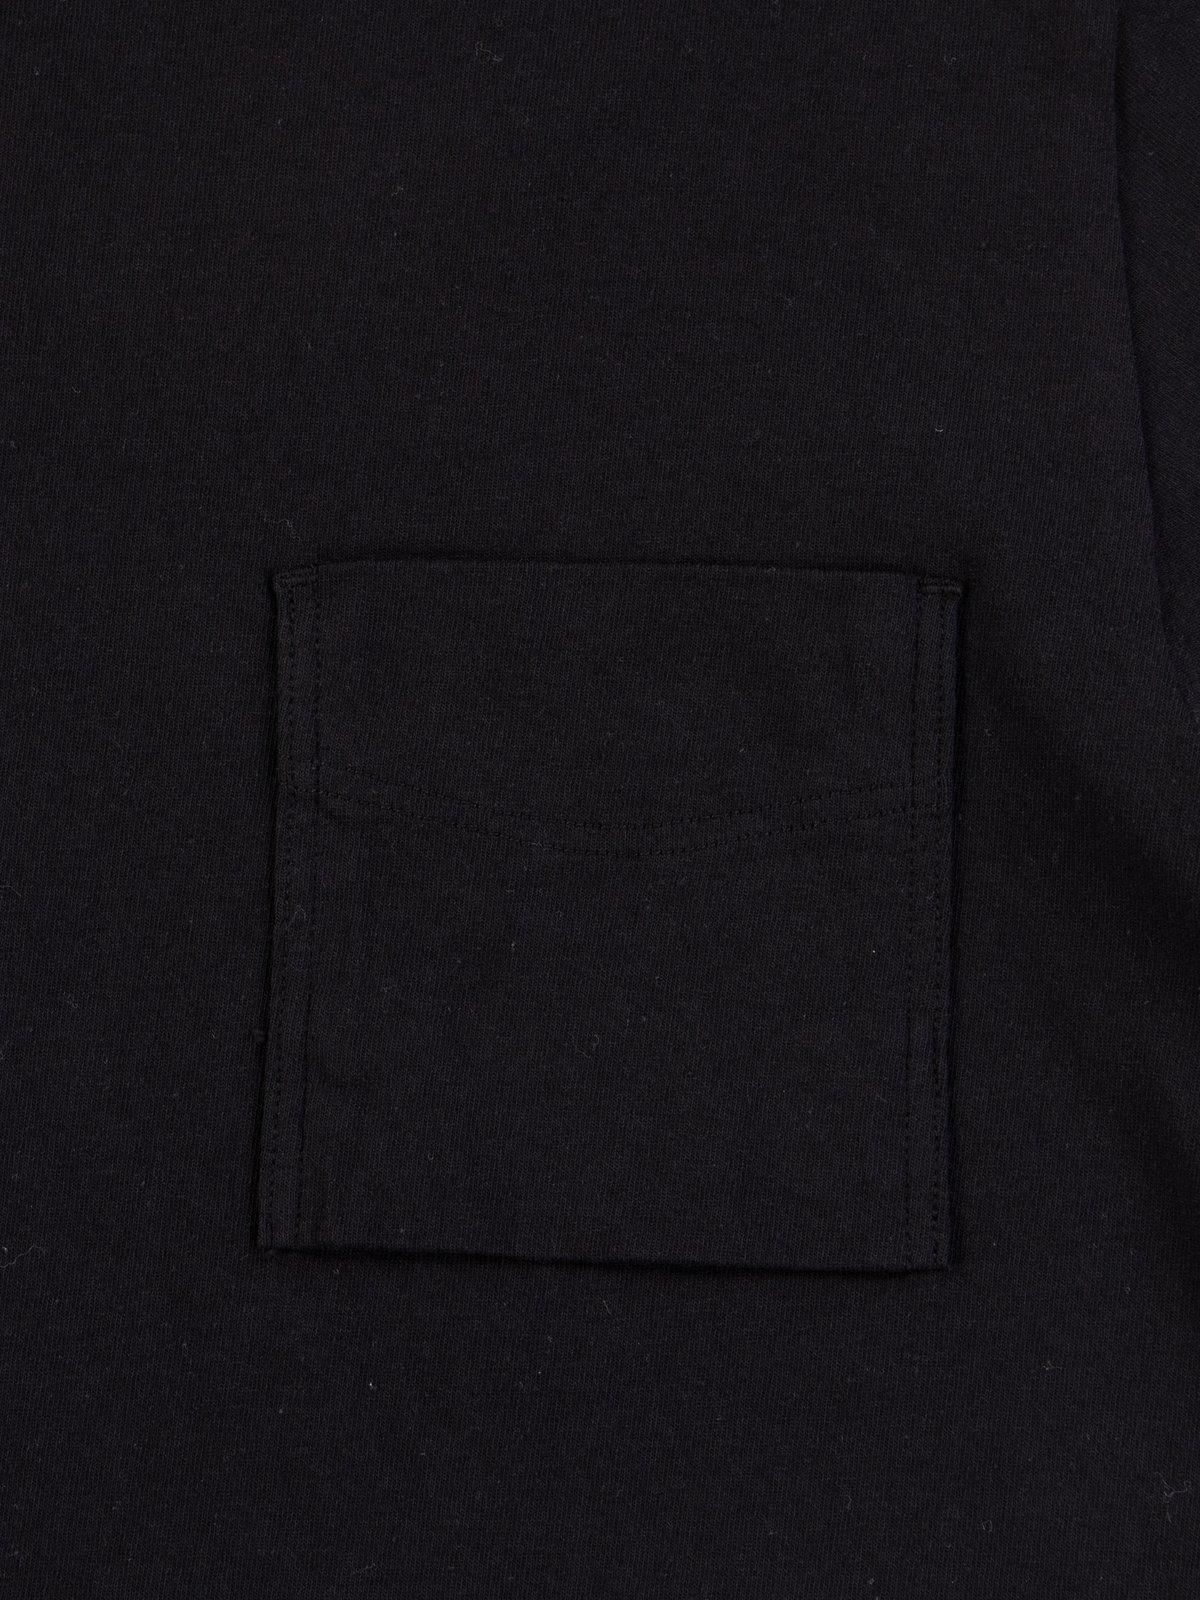 Black Pocket T–Shirt - Image 5